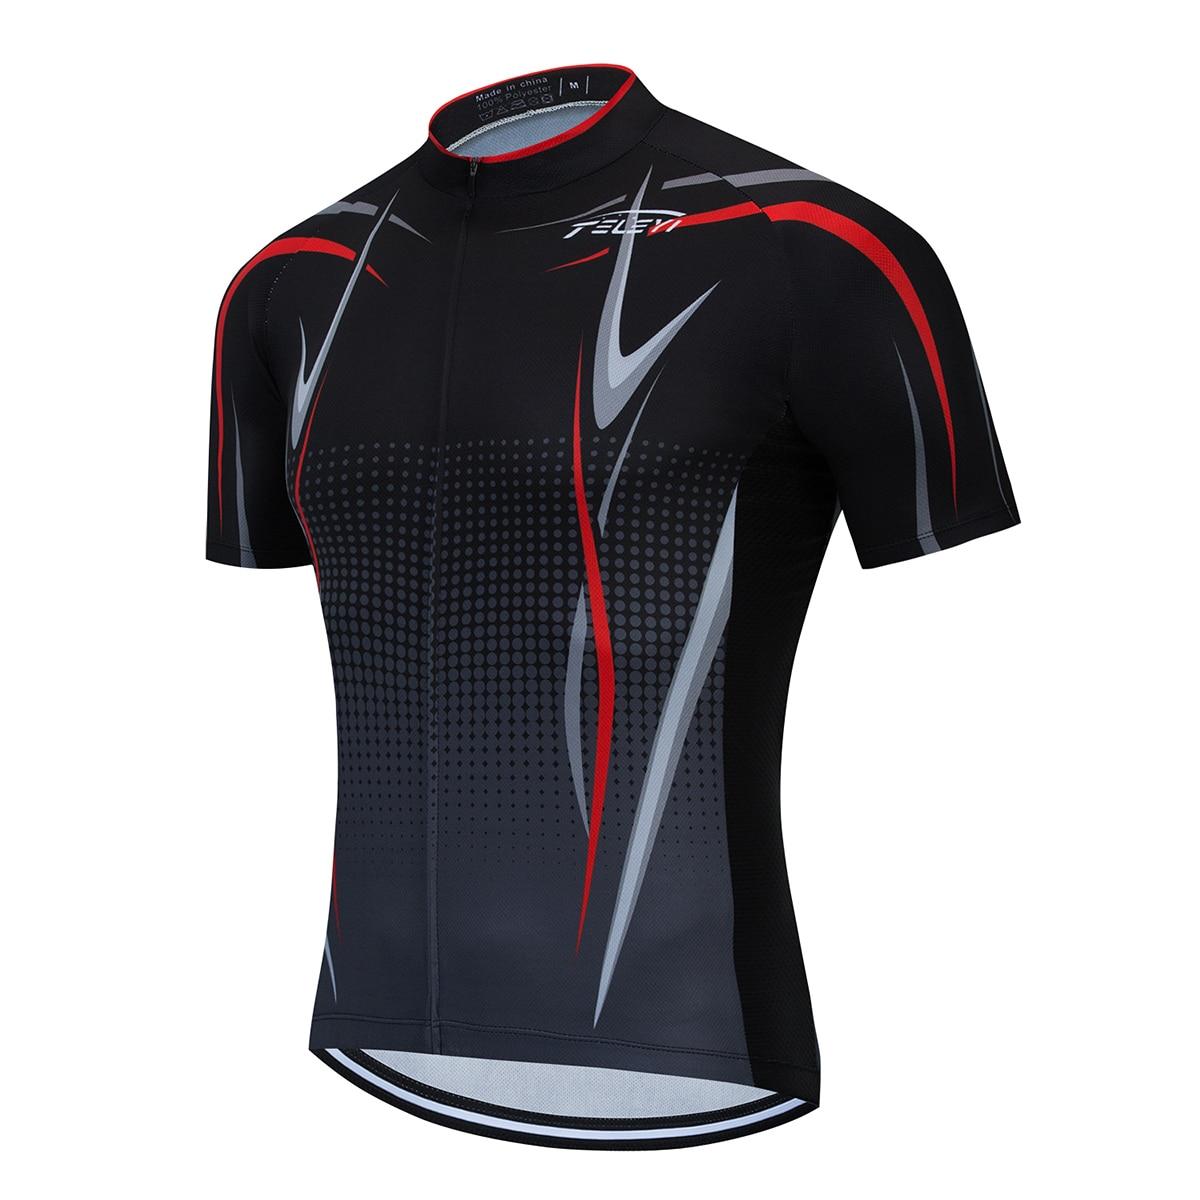 Pro Team-camisetas de manga corta para Ciclismo, camisetas de verano para hombre para Ciclismo de montaña o de carretera, 2020